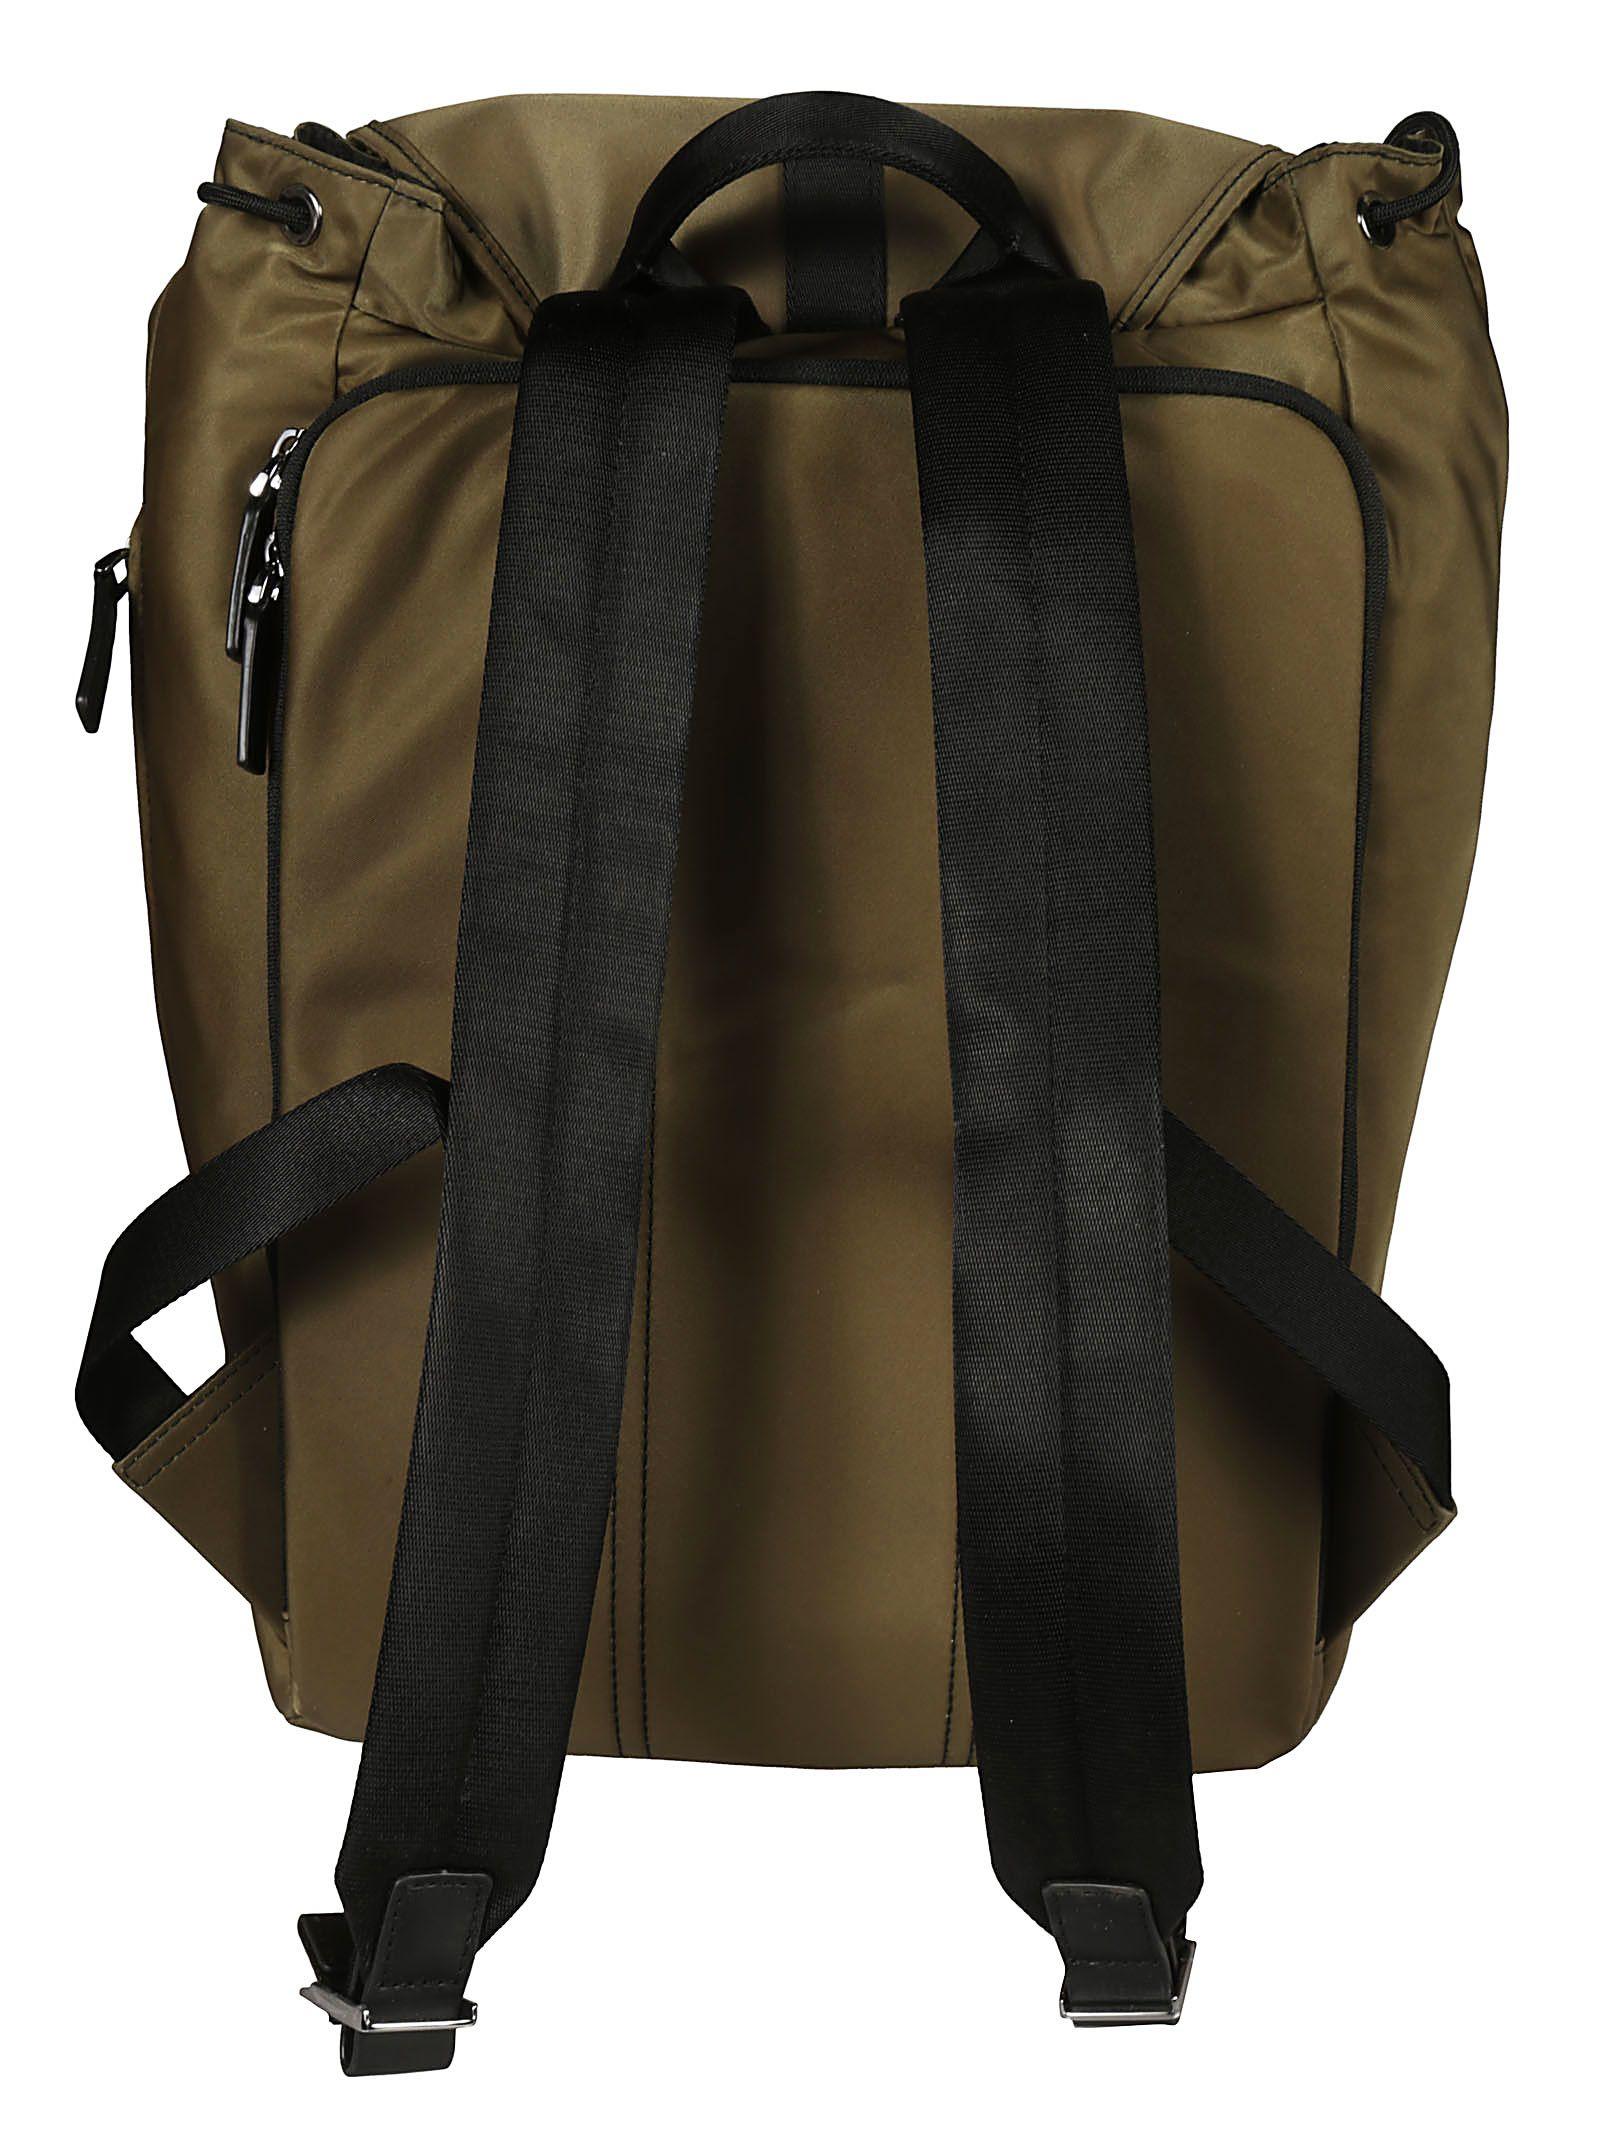 2481b32c0f1ff1 Michael Kors Kent Nylon Drawstring Backpack – Patmo Technologies Limited